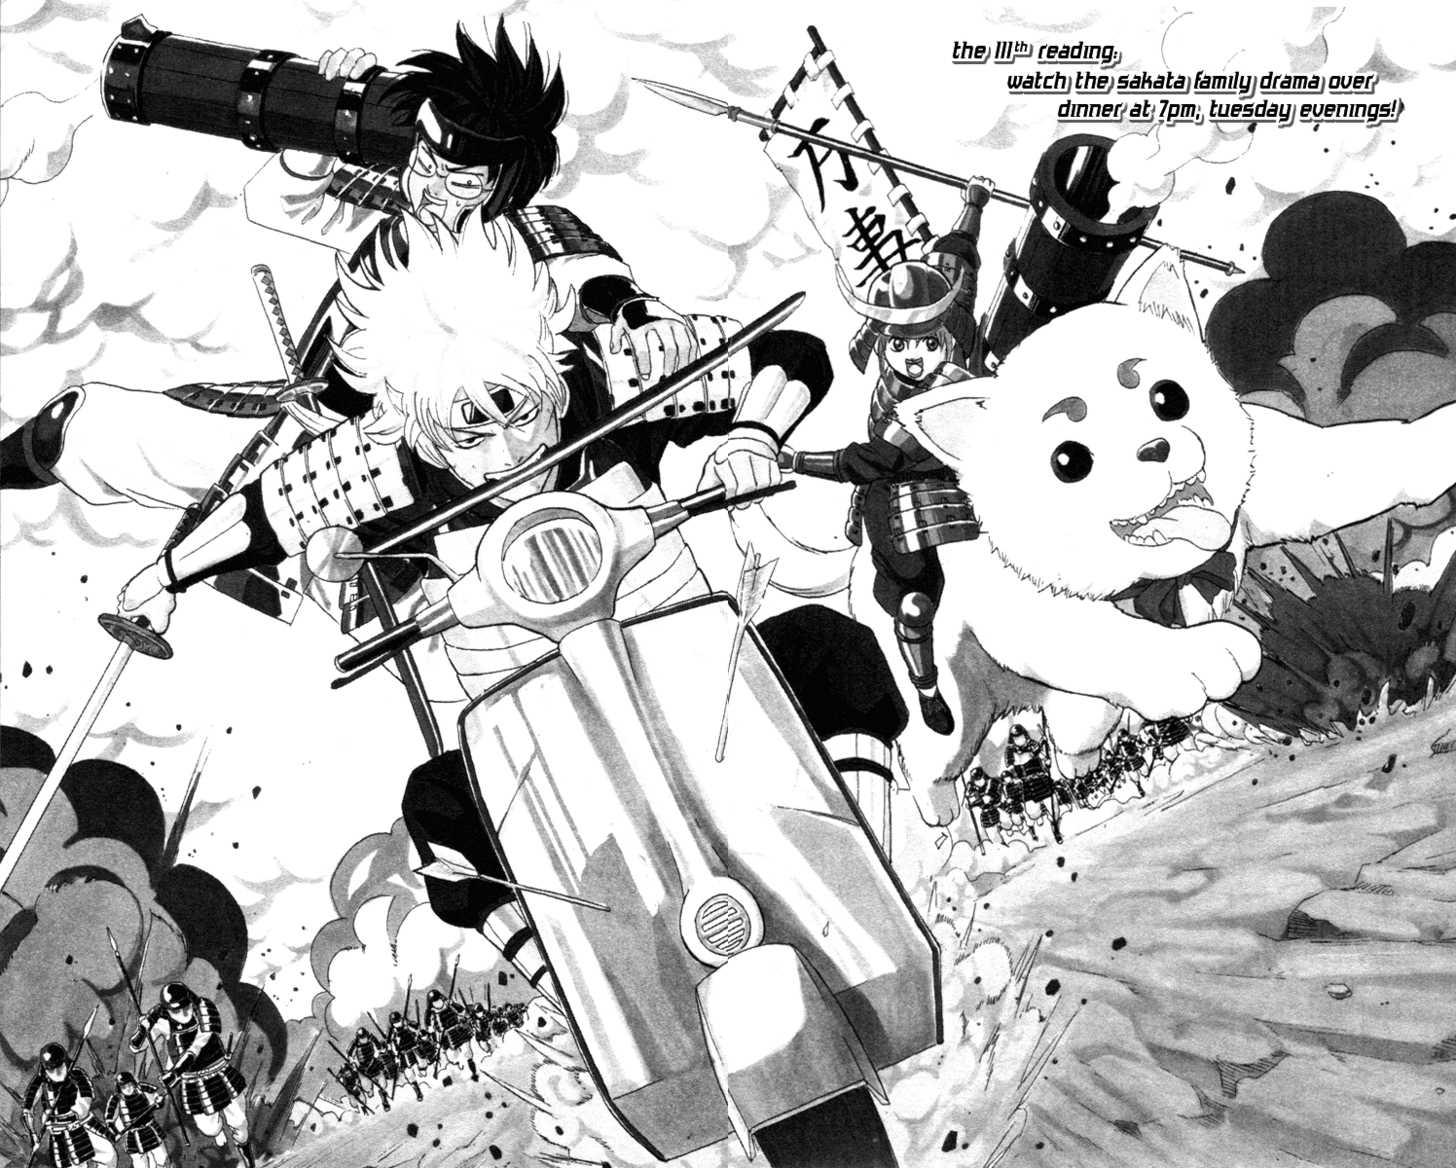 http://im.nineanime.com/comics/pic9/18/210/16524/Gintama1110872.jpg Page 1